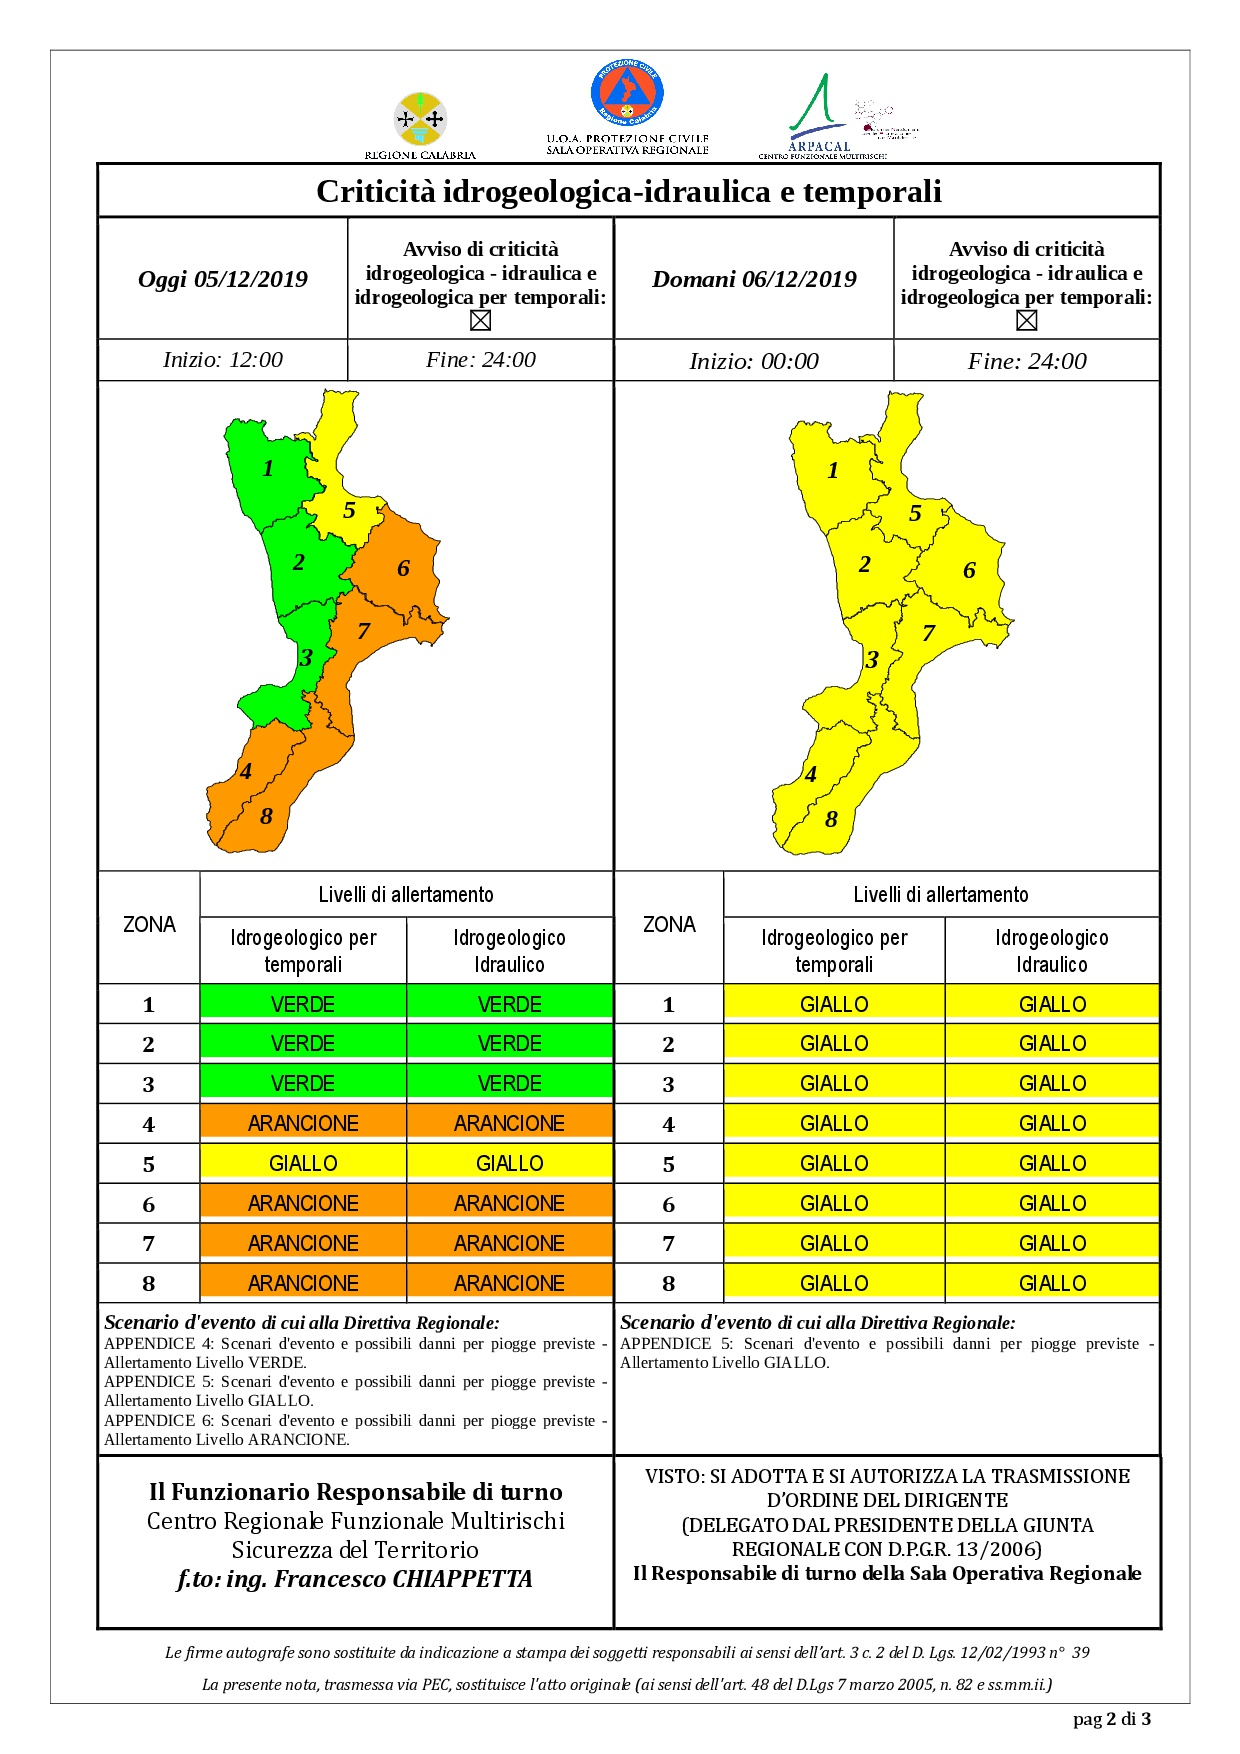 Criticità idrogeologica-idraulica e temporali in Calabria 05-12-2019